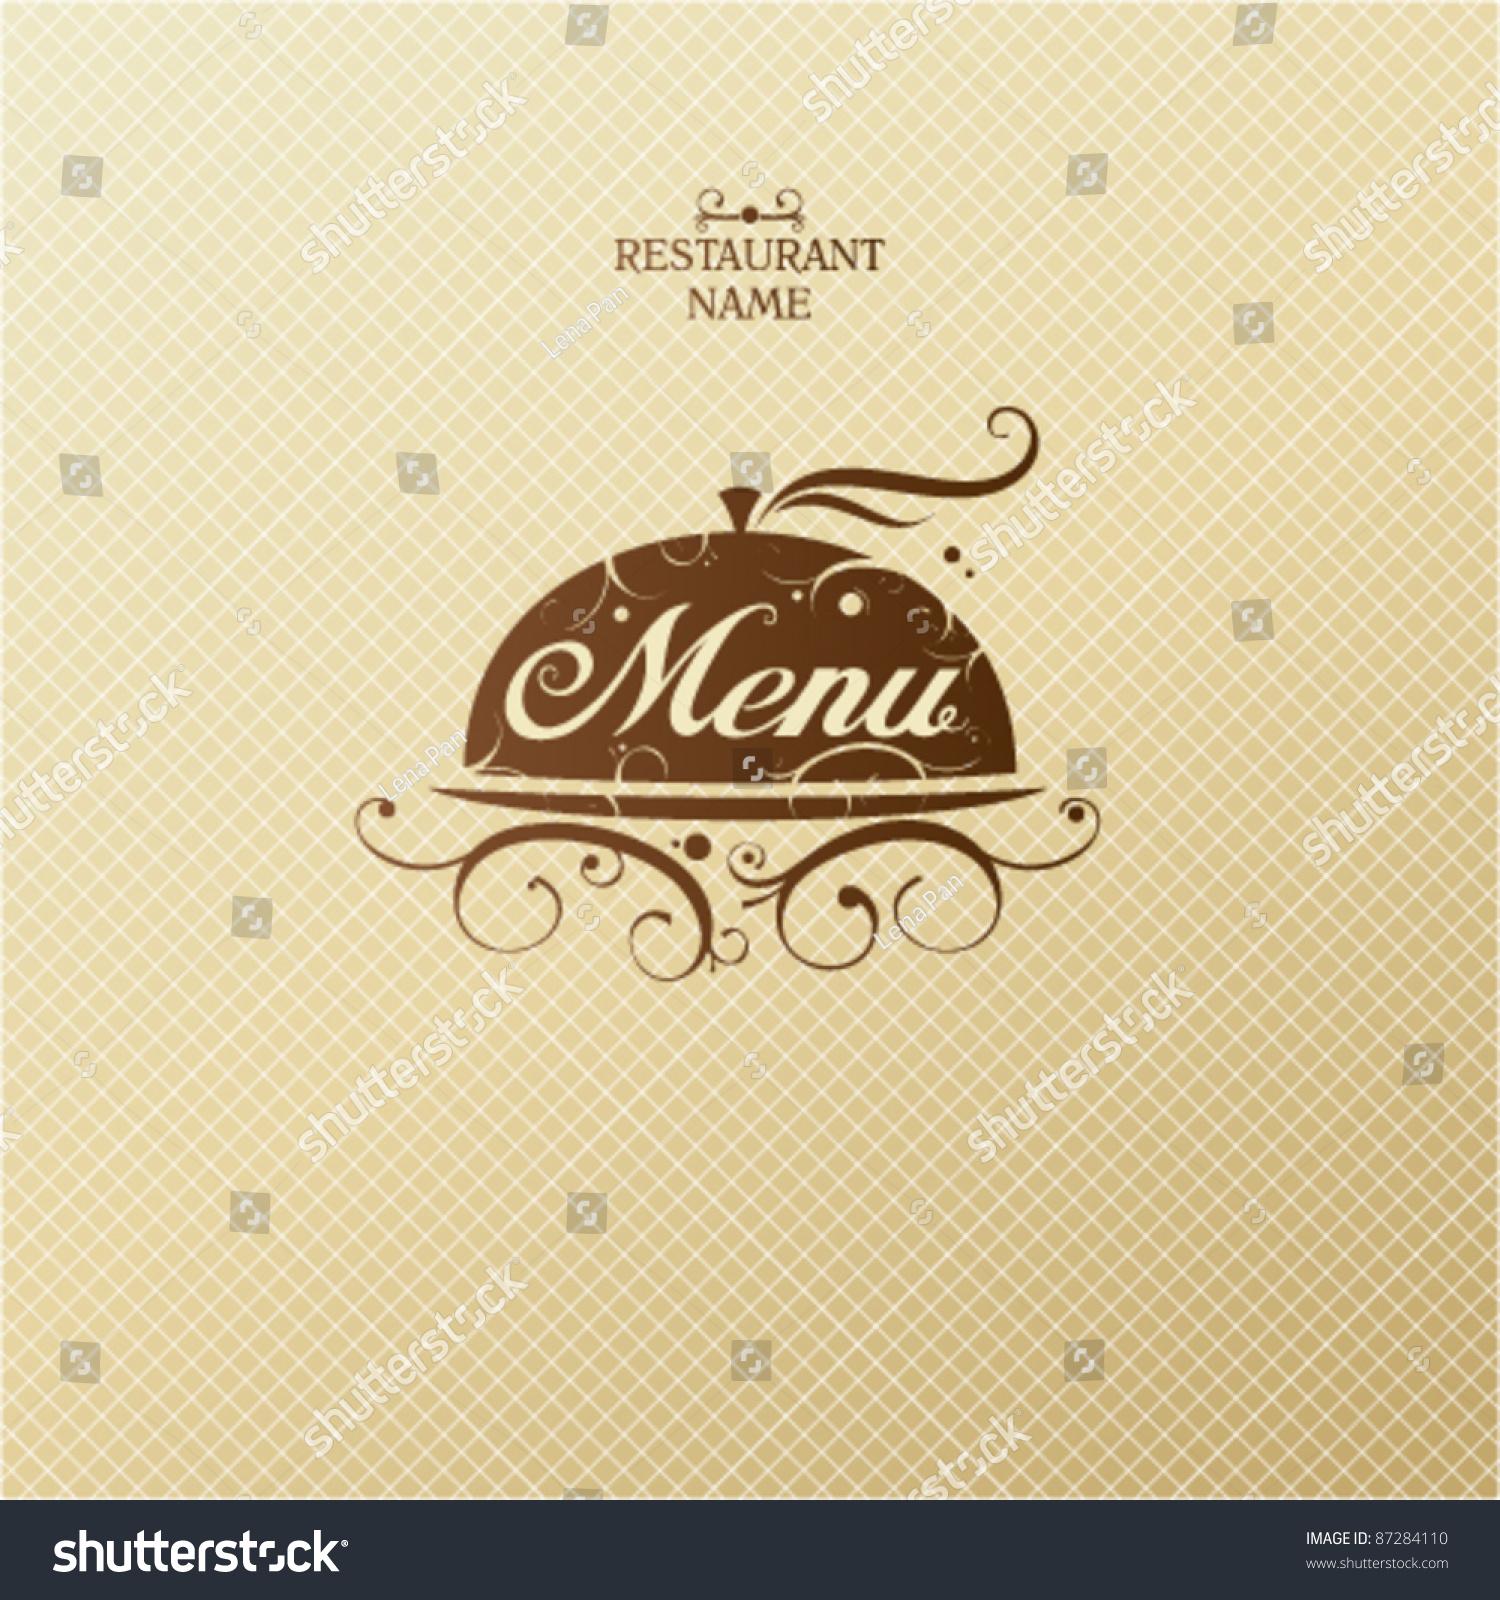 restaurant menu card design template stock vector 87284110